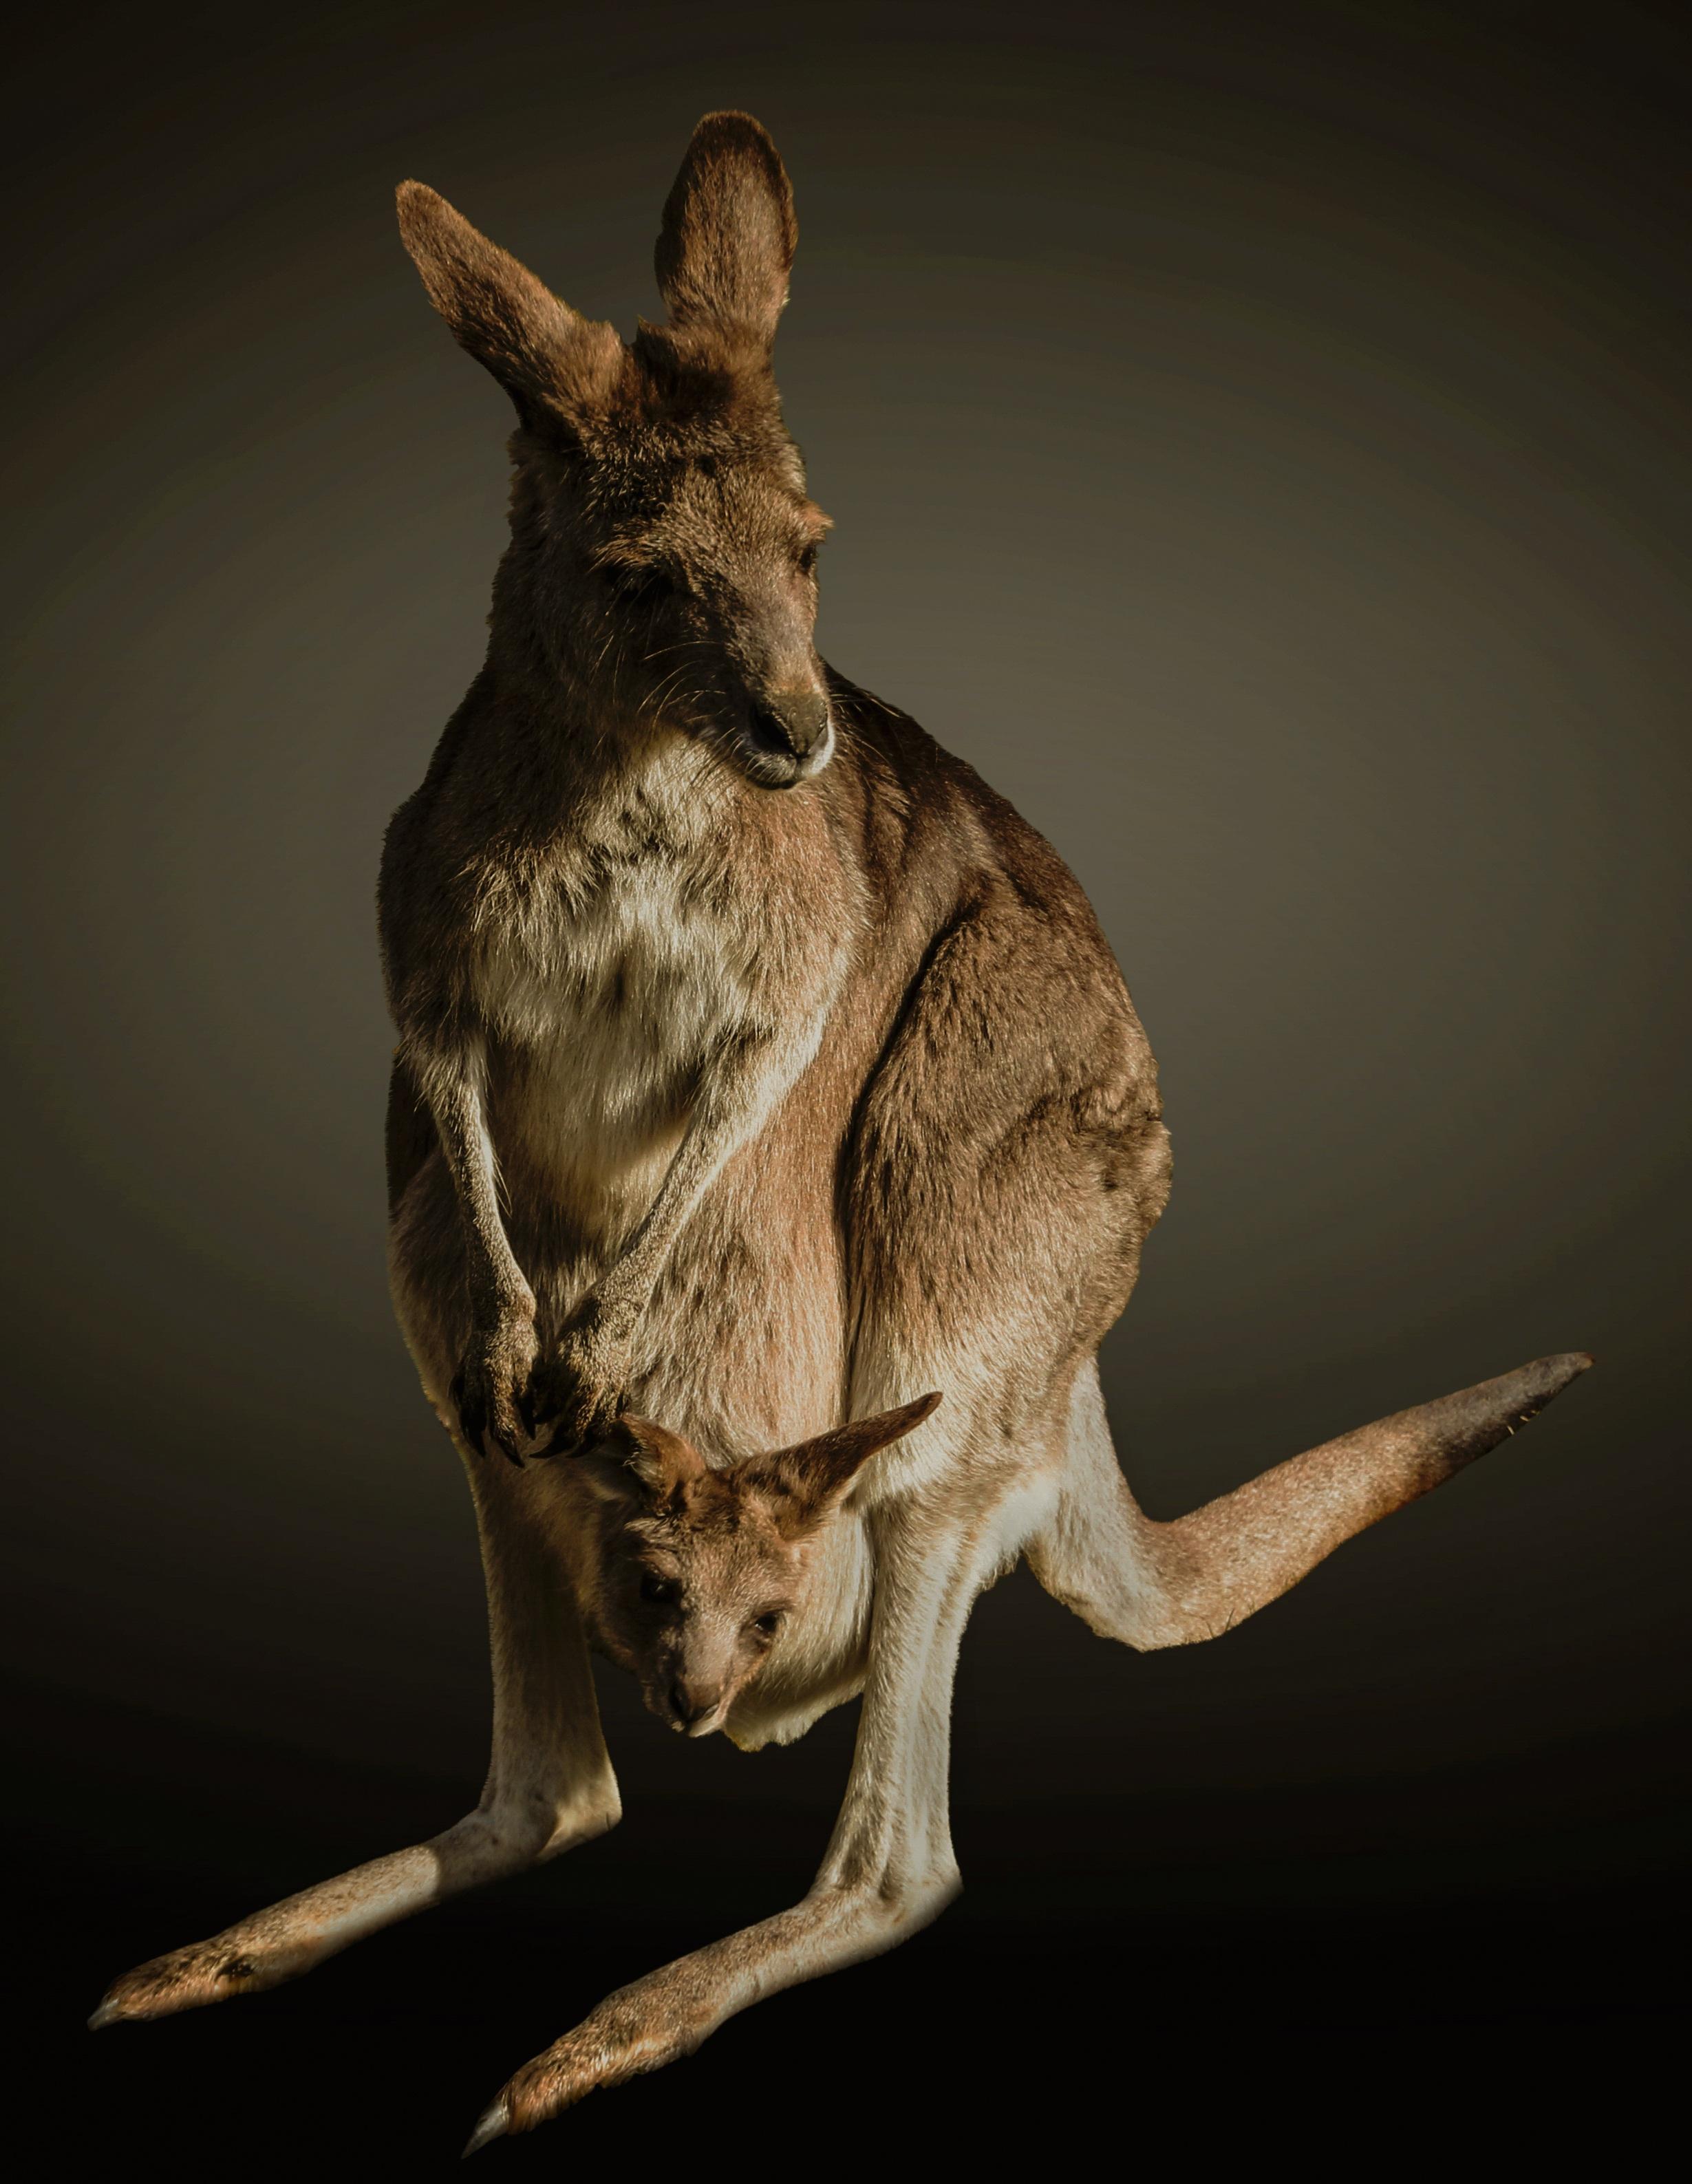 Kangaroo in the zoo photo